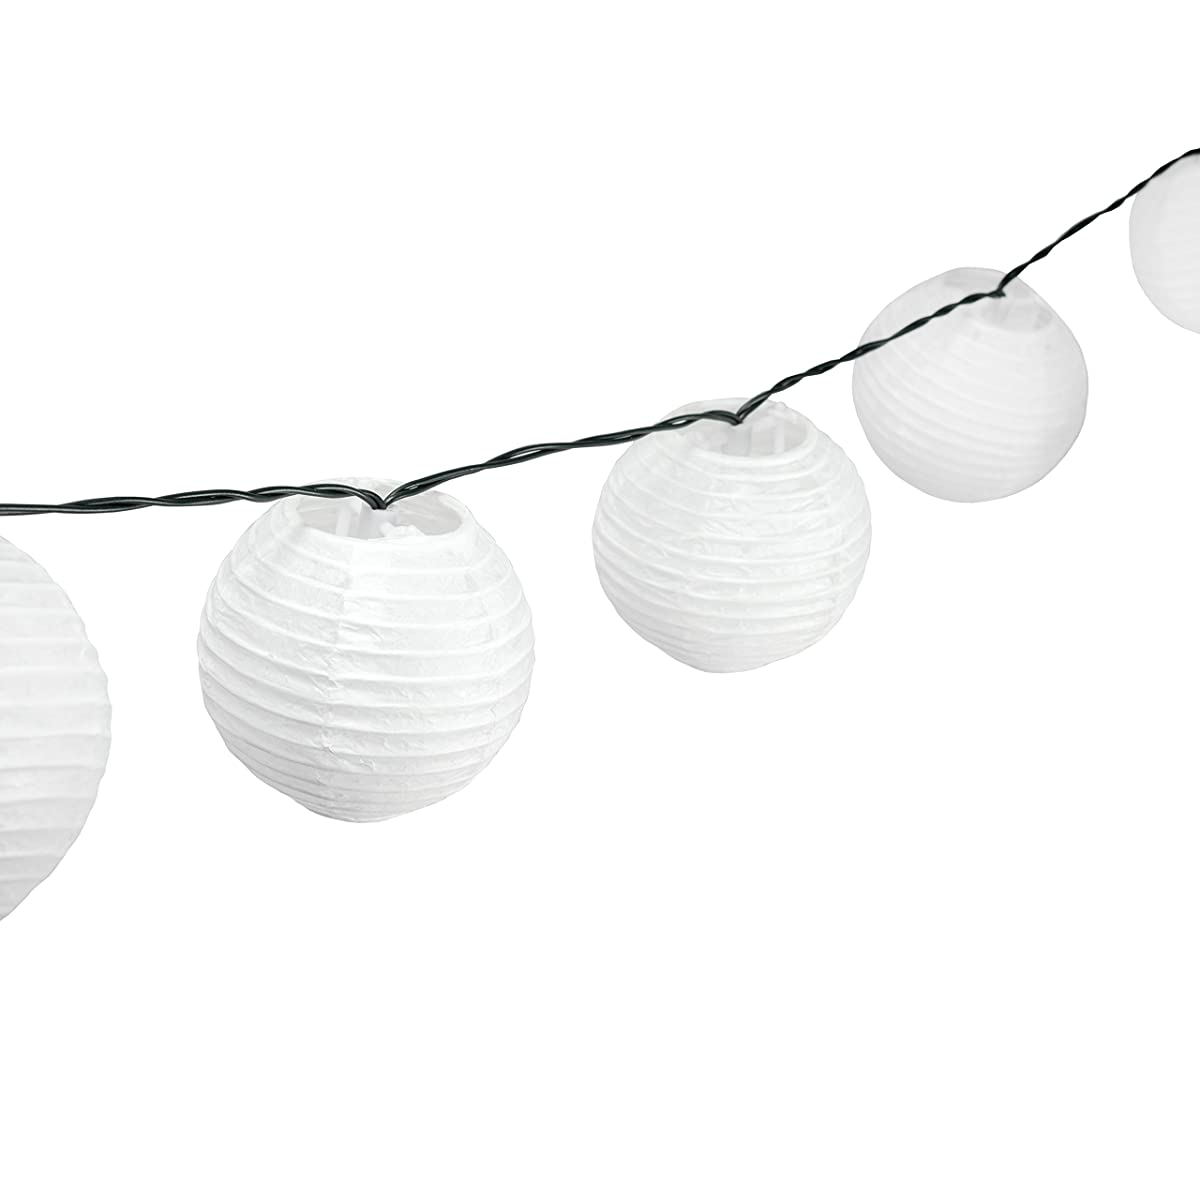 Solar Powered Lanterns String Lights - Outdoor Lighting - 25 LED Globe Lights Per String - 20 Feet